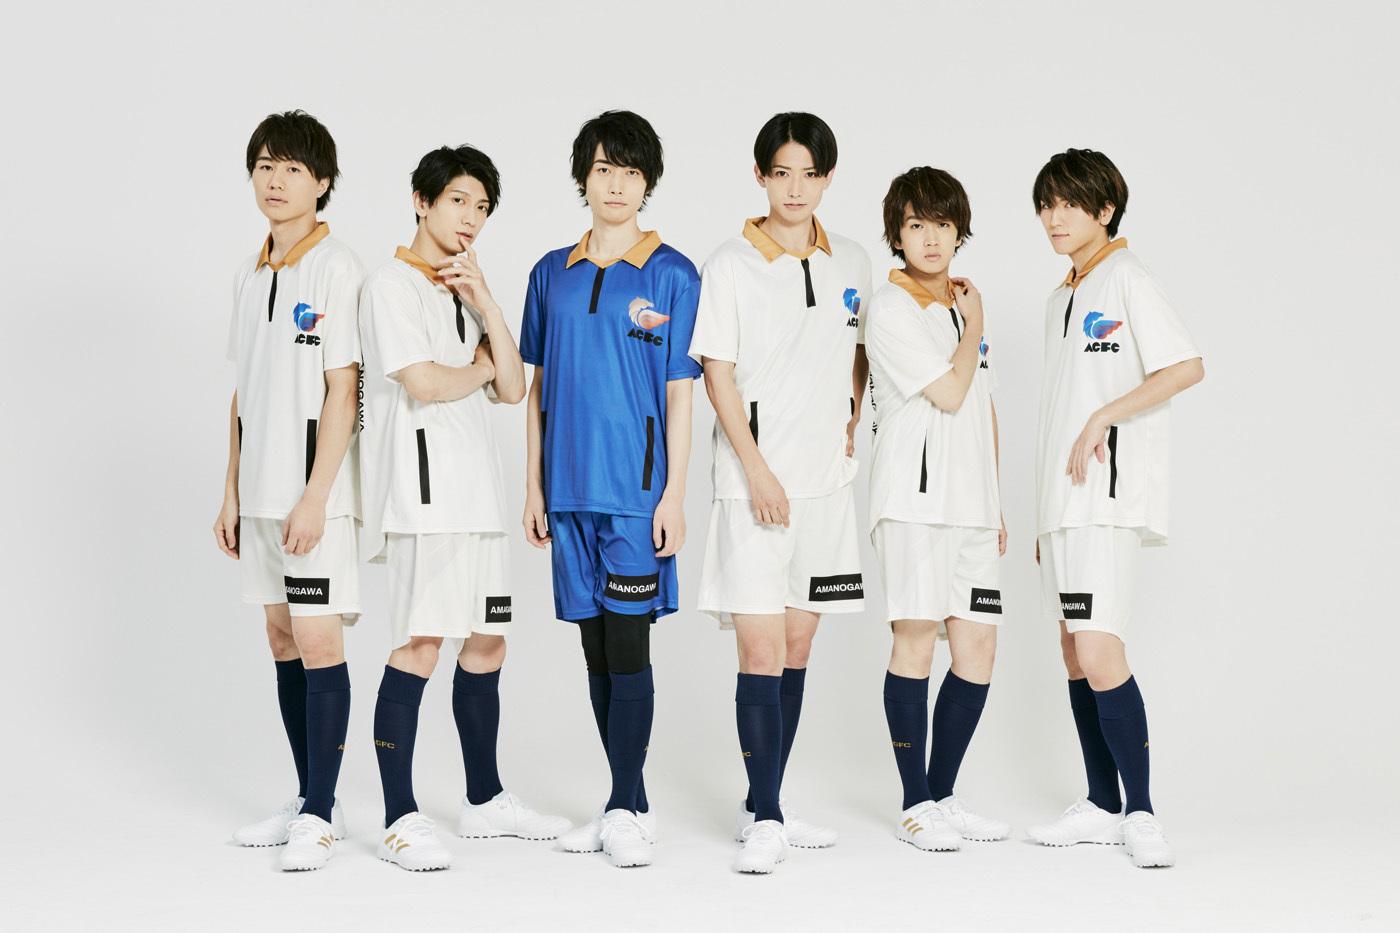 天ノ川学園集合 (C)FUTSAL BOYS!!!!! ORIGINAL WORK